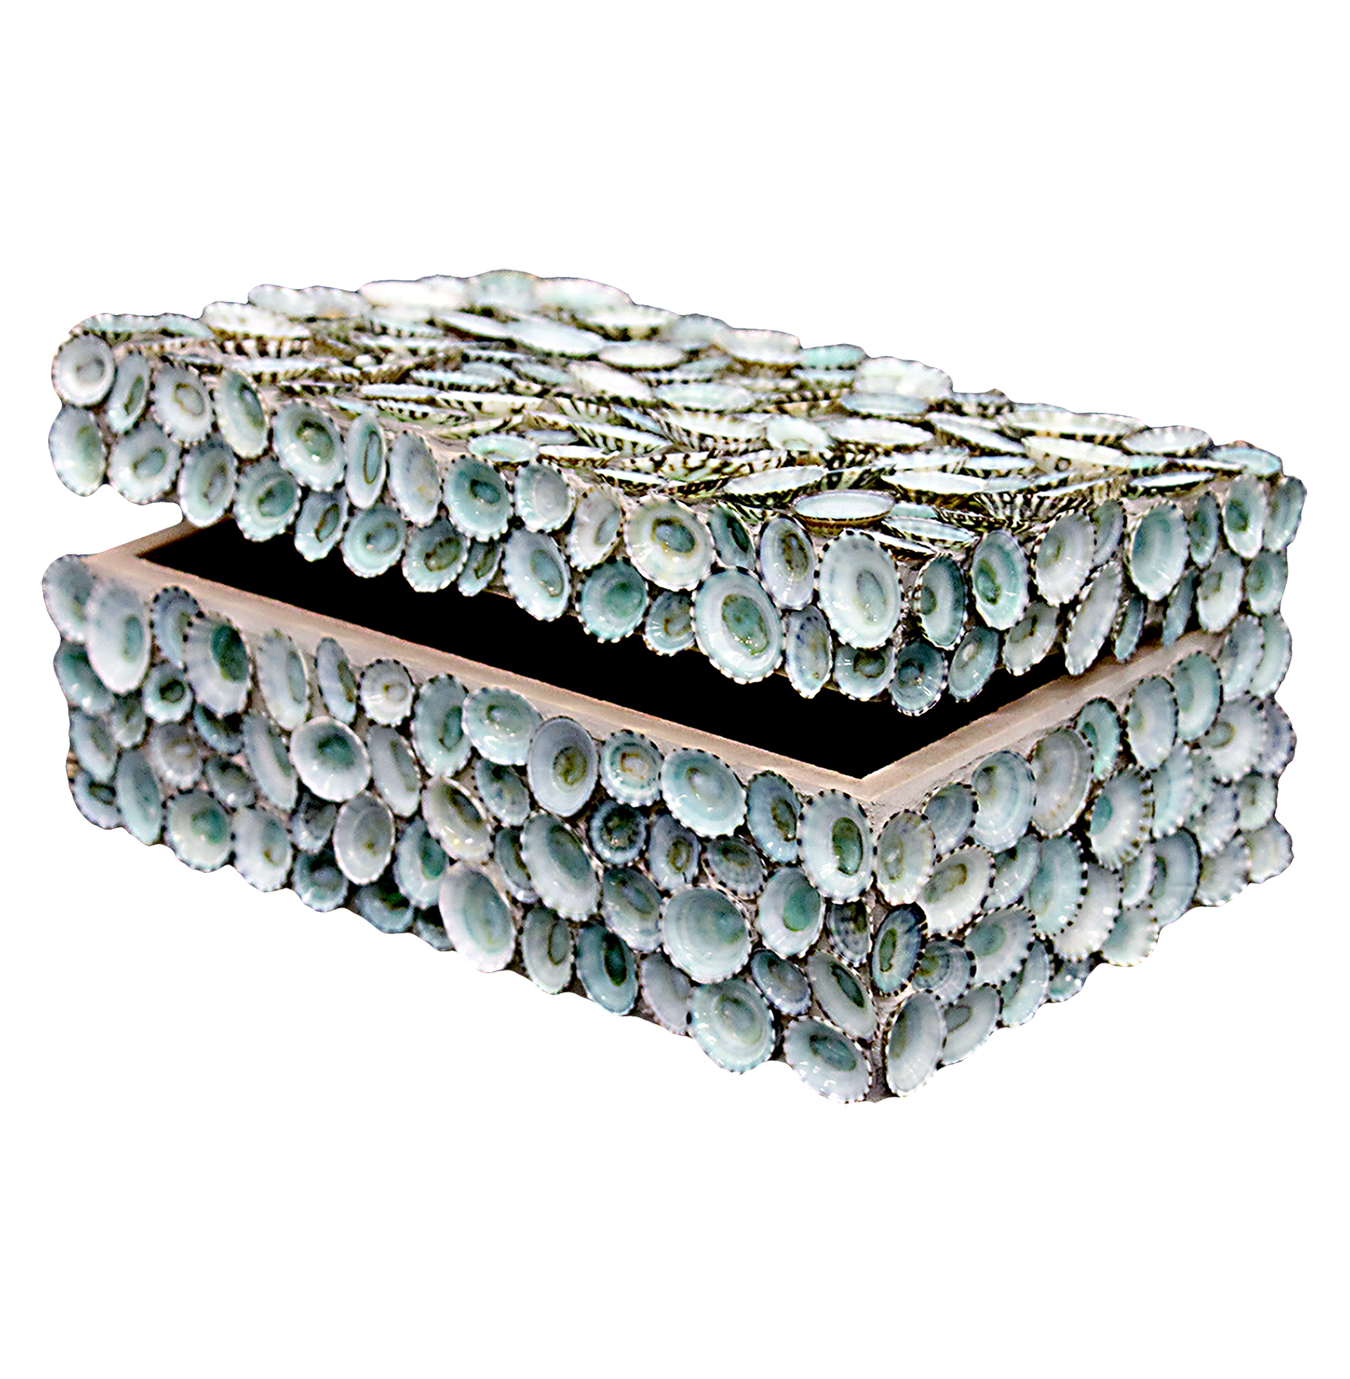 Oyster Bay Coastal Blue Limpet Shell Decorative Box - by Karen Robertson